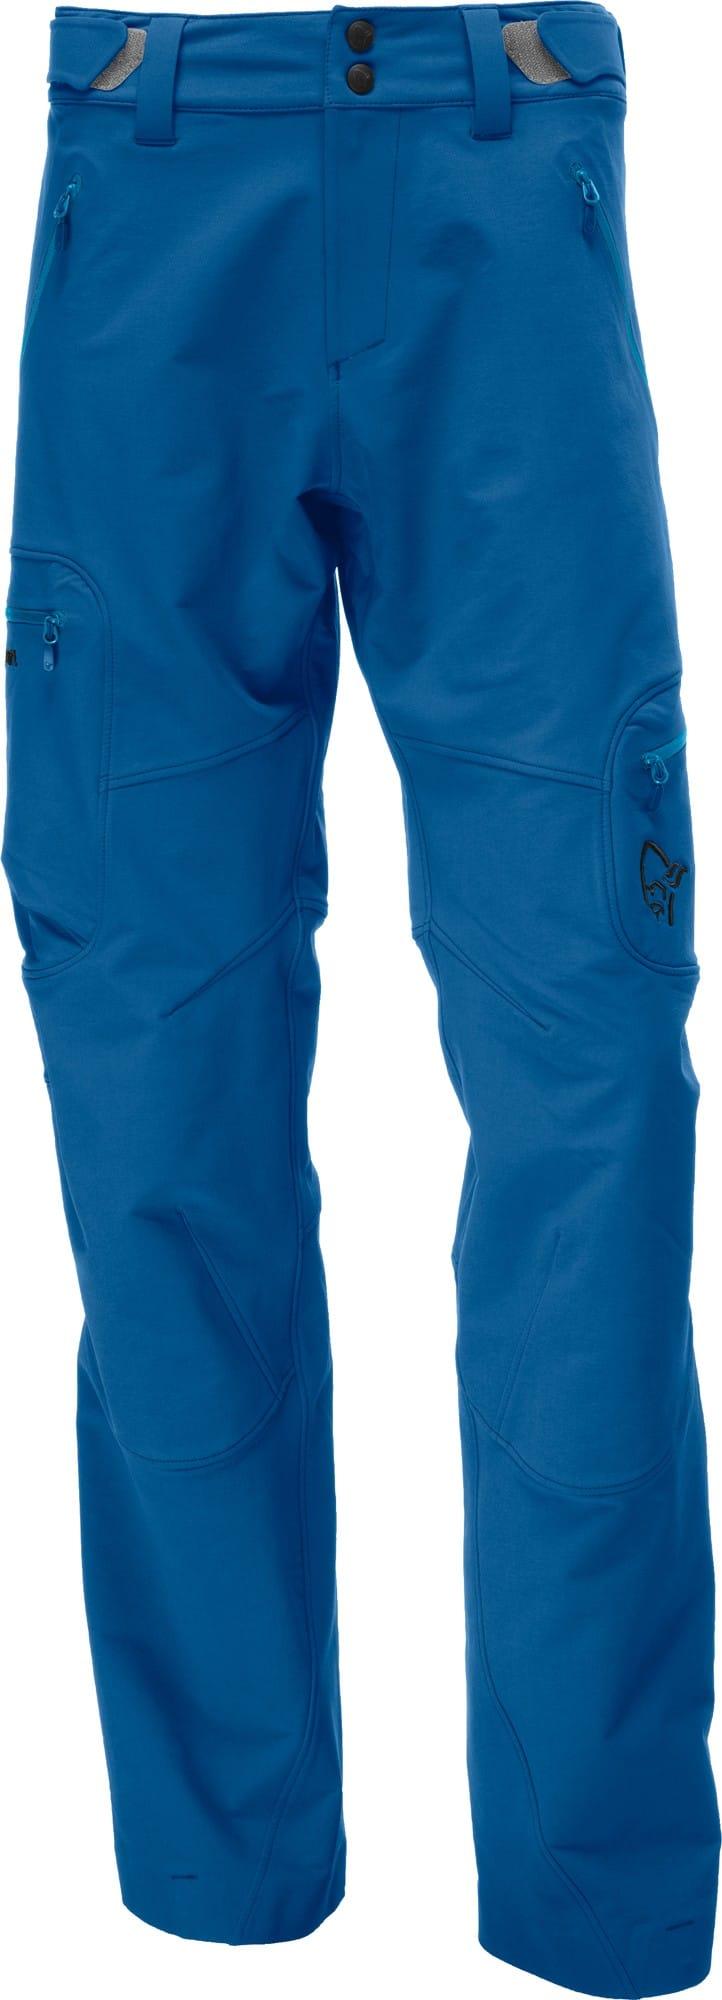 Norrona Svalbard Flex1 Pants Blau, Male Hose, L